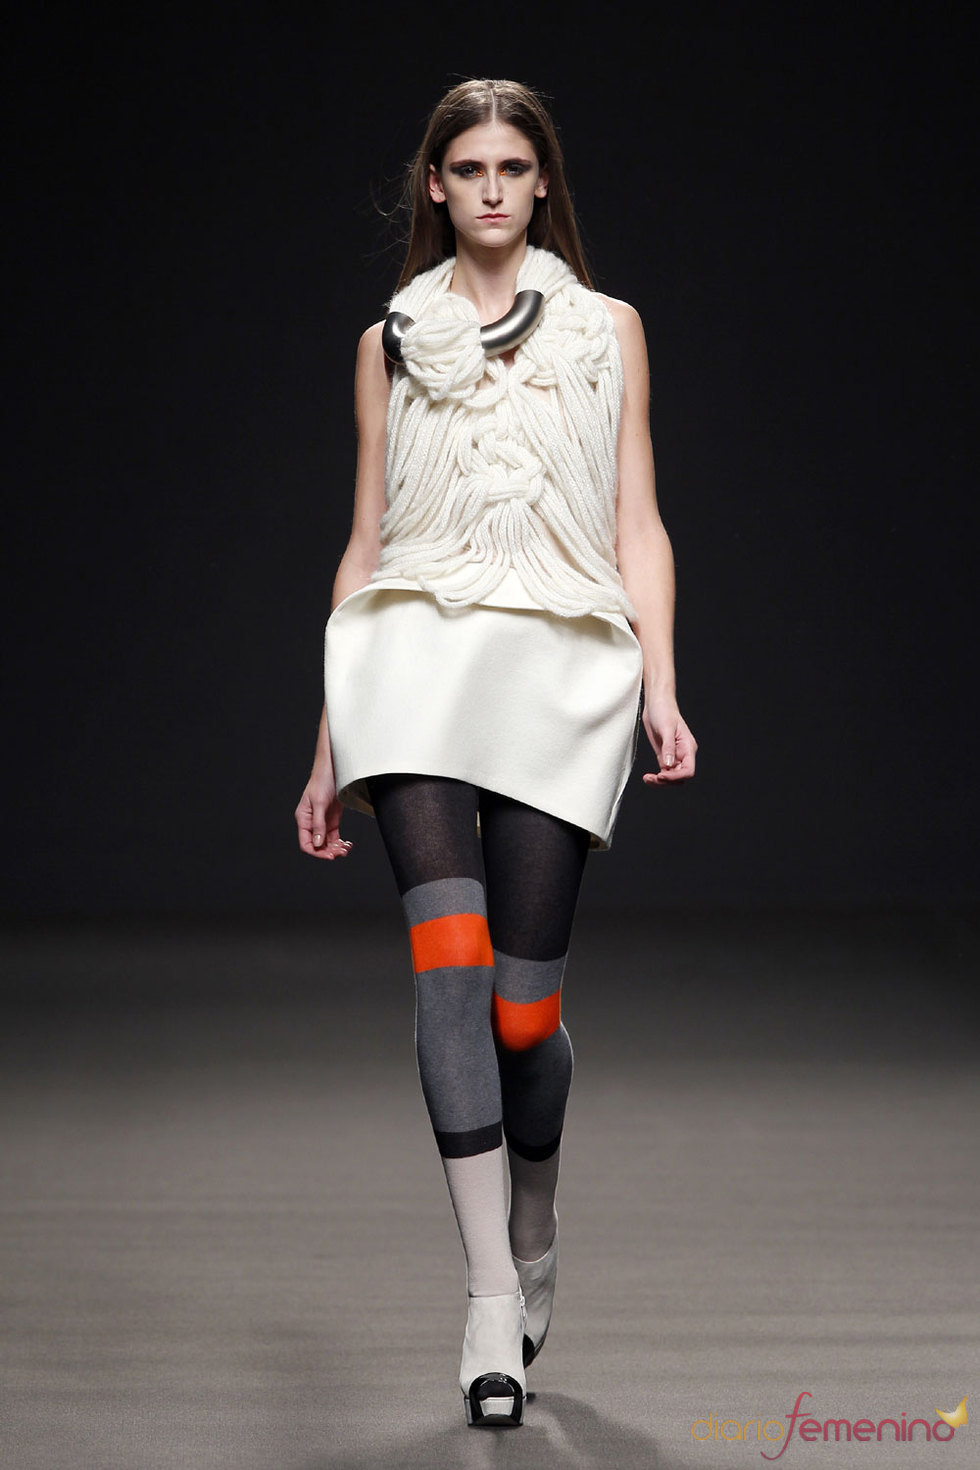 Moda Otoño Invierno - Amaya Arzuaga